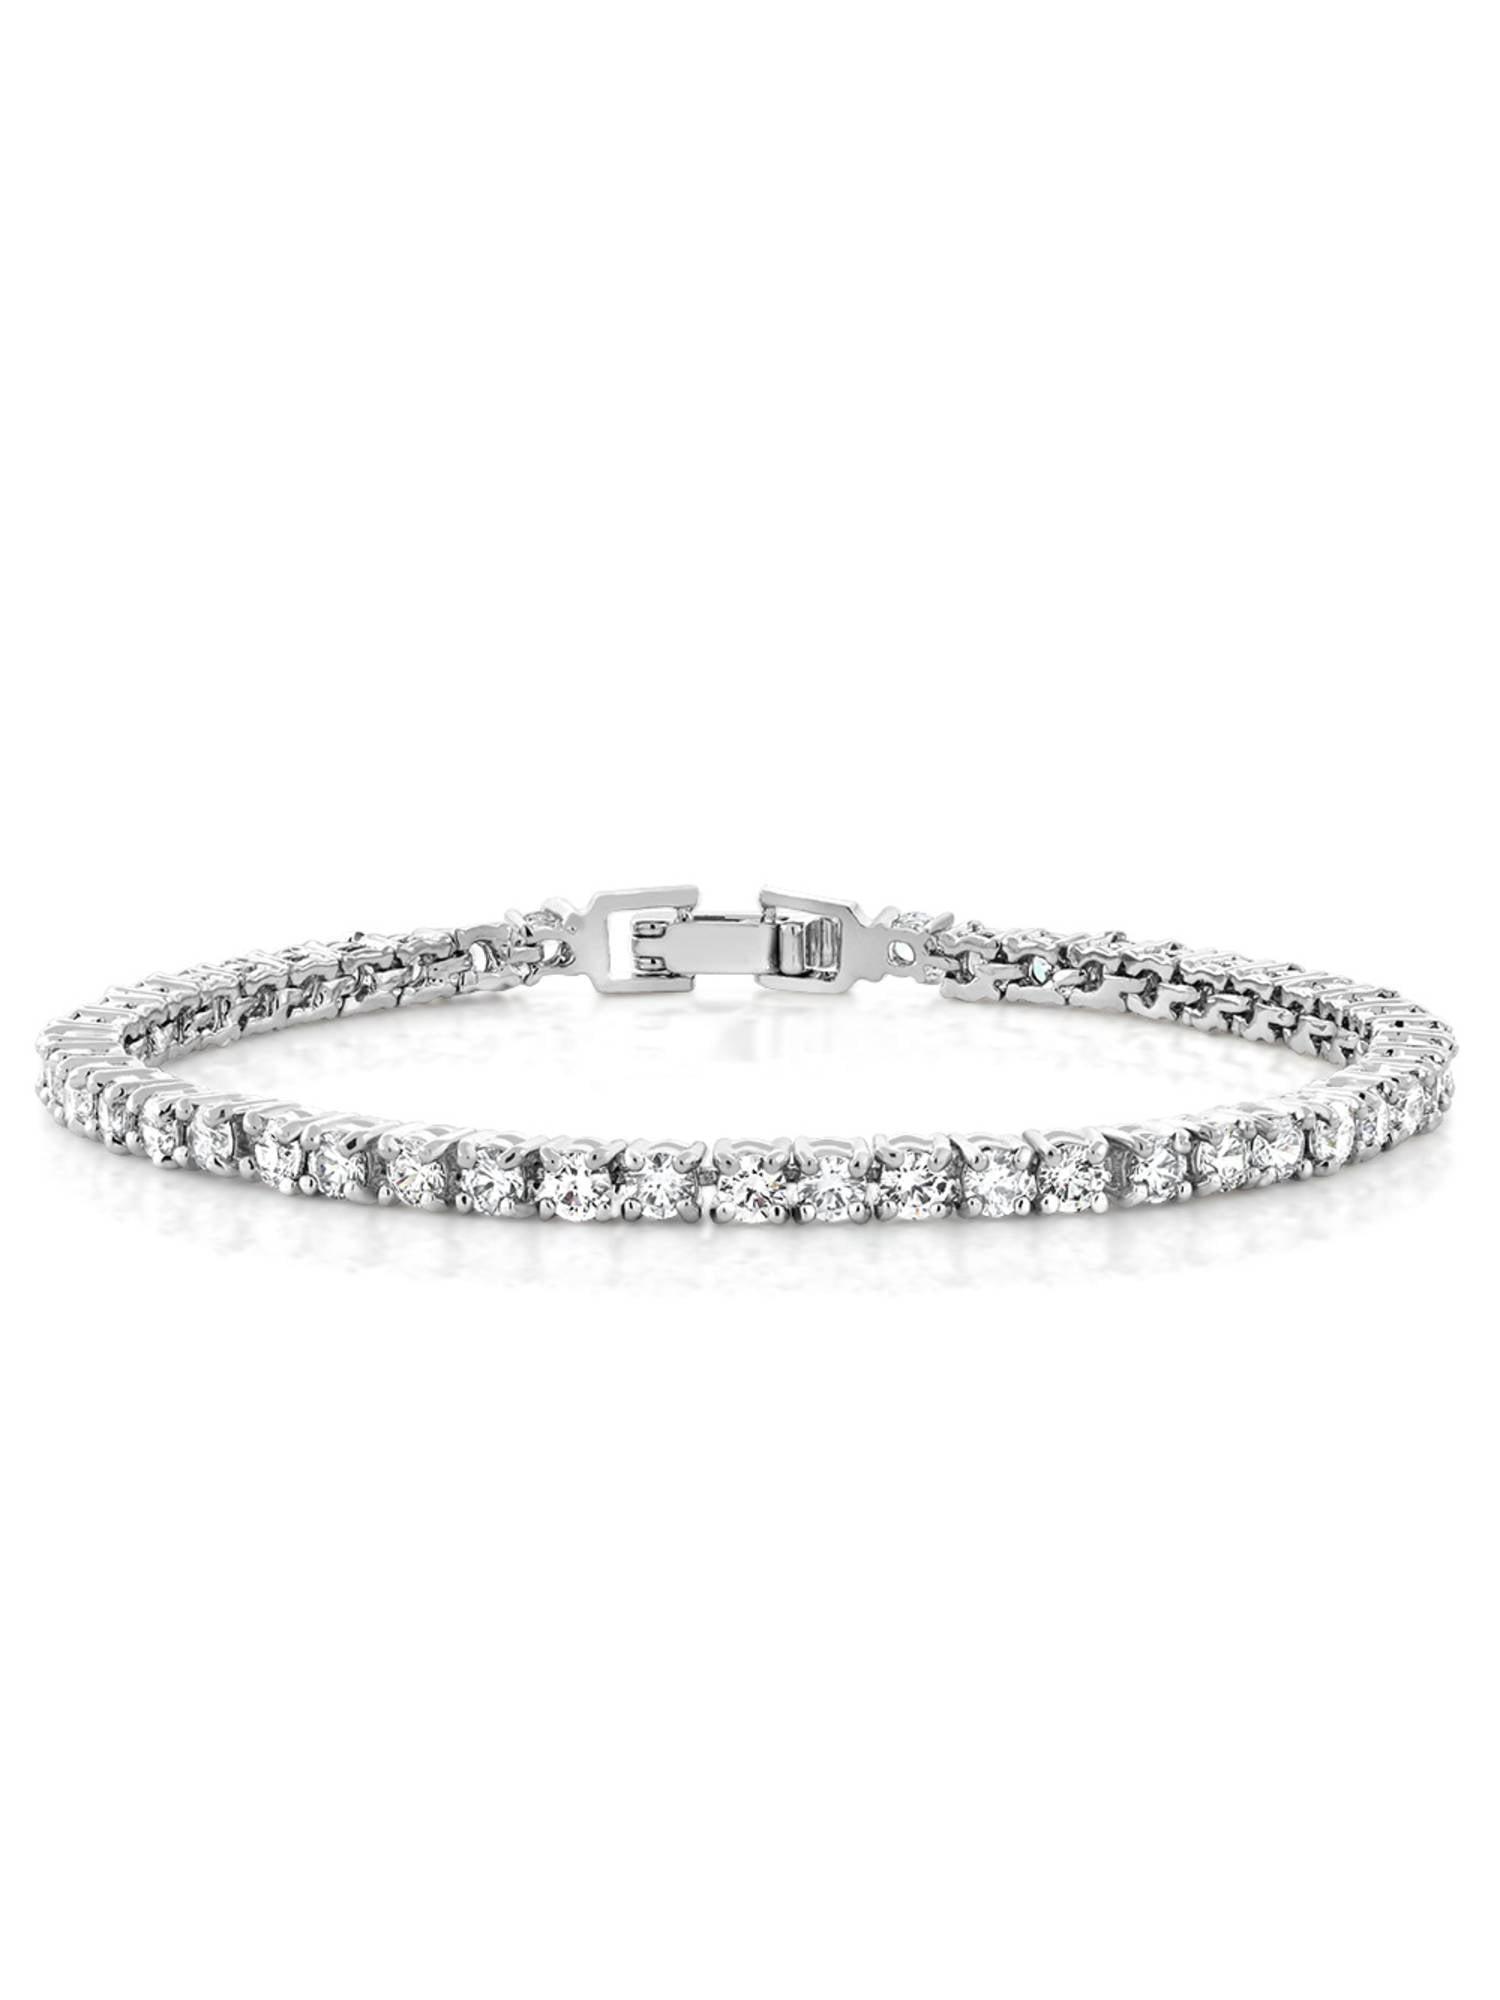 "10.00 Ct Round Cut Stunning Cubic Zirconia CZ 7"" Tennis Bracelet 7 Inch"